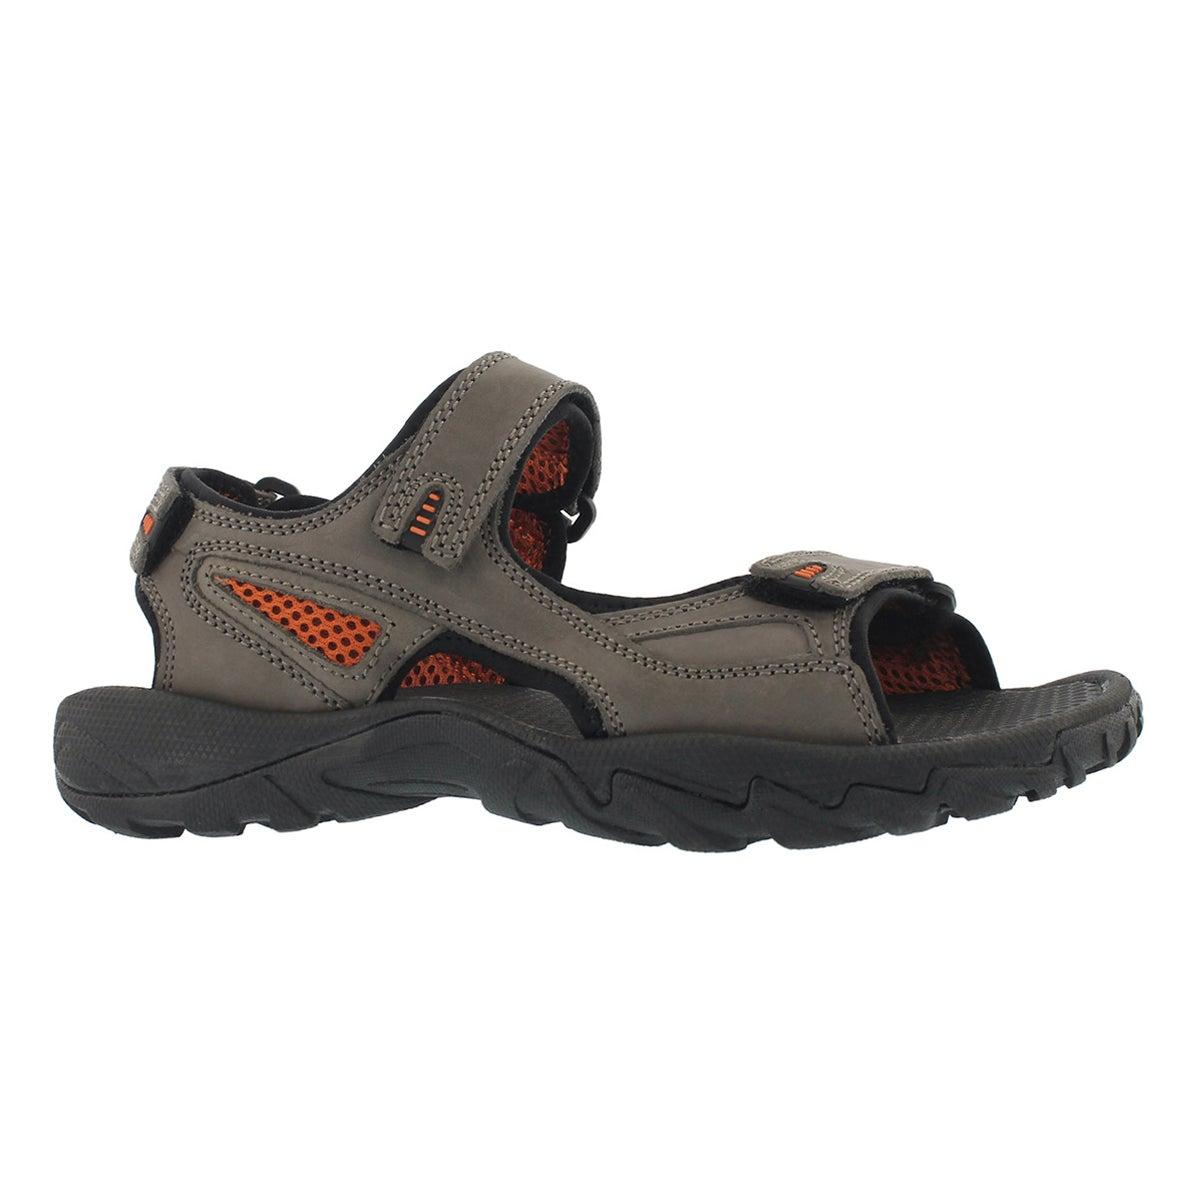 Men's LUCIUS 2 grey 3 strap sandal